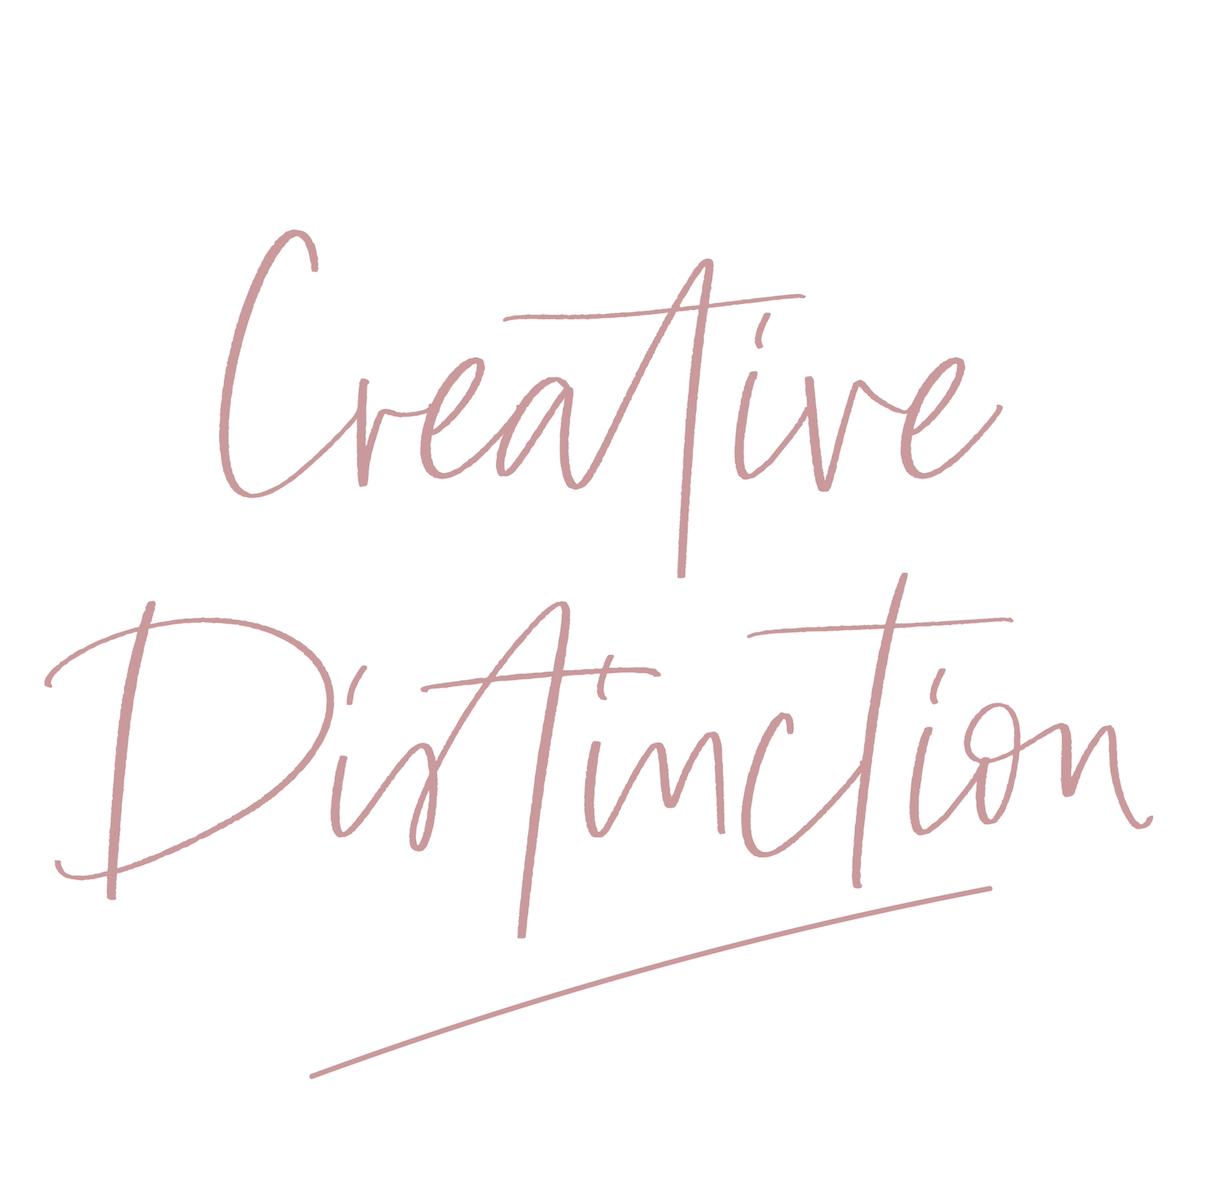 Valley Loves Creative Distinction 2